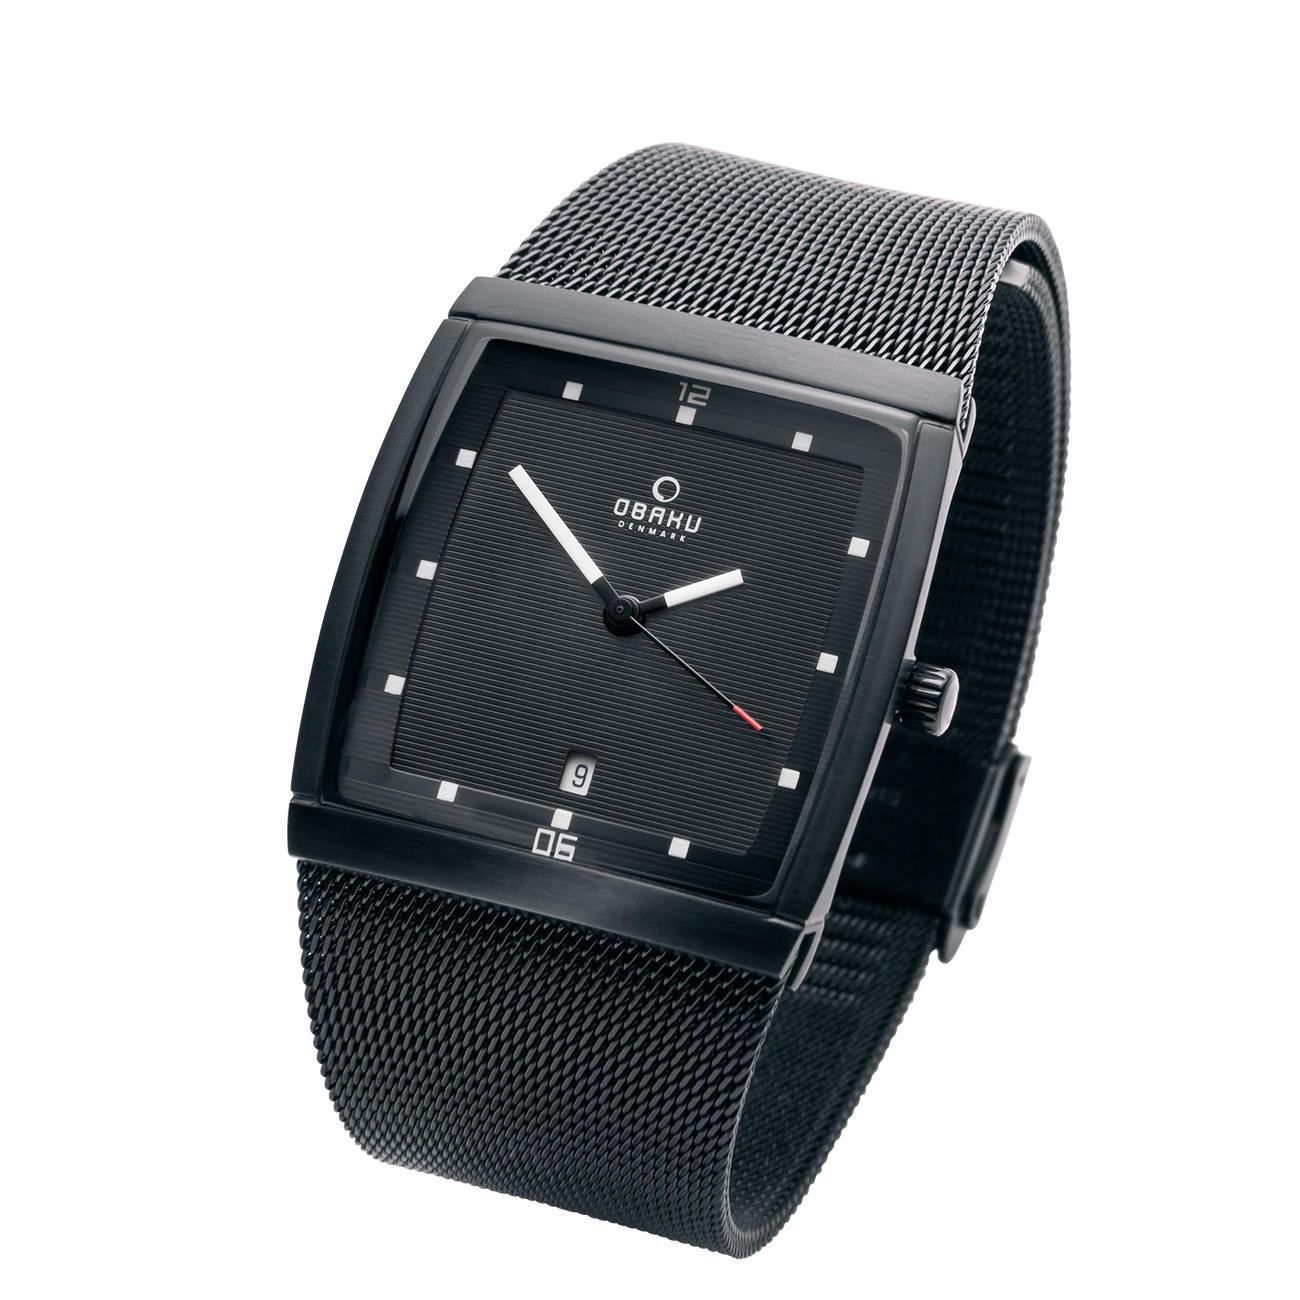 Obaku Vierkant Horloge 3 Jaar Productgarantie Pro Idee